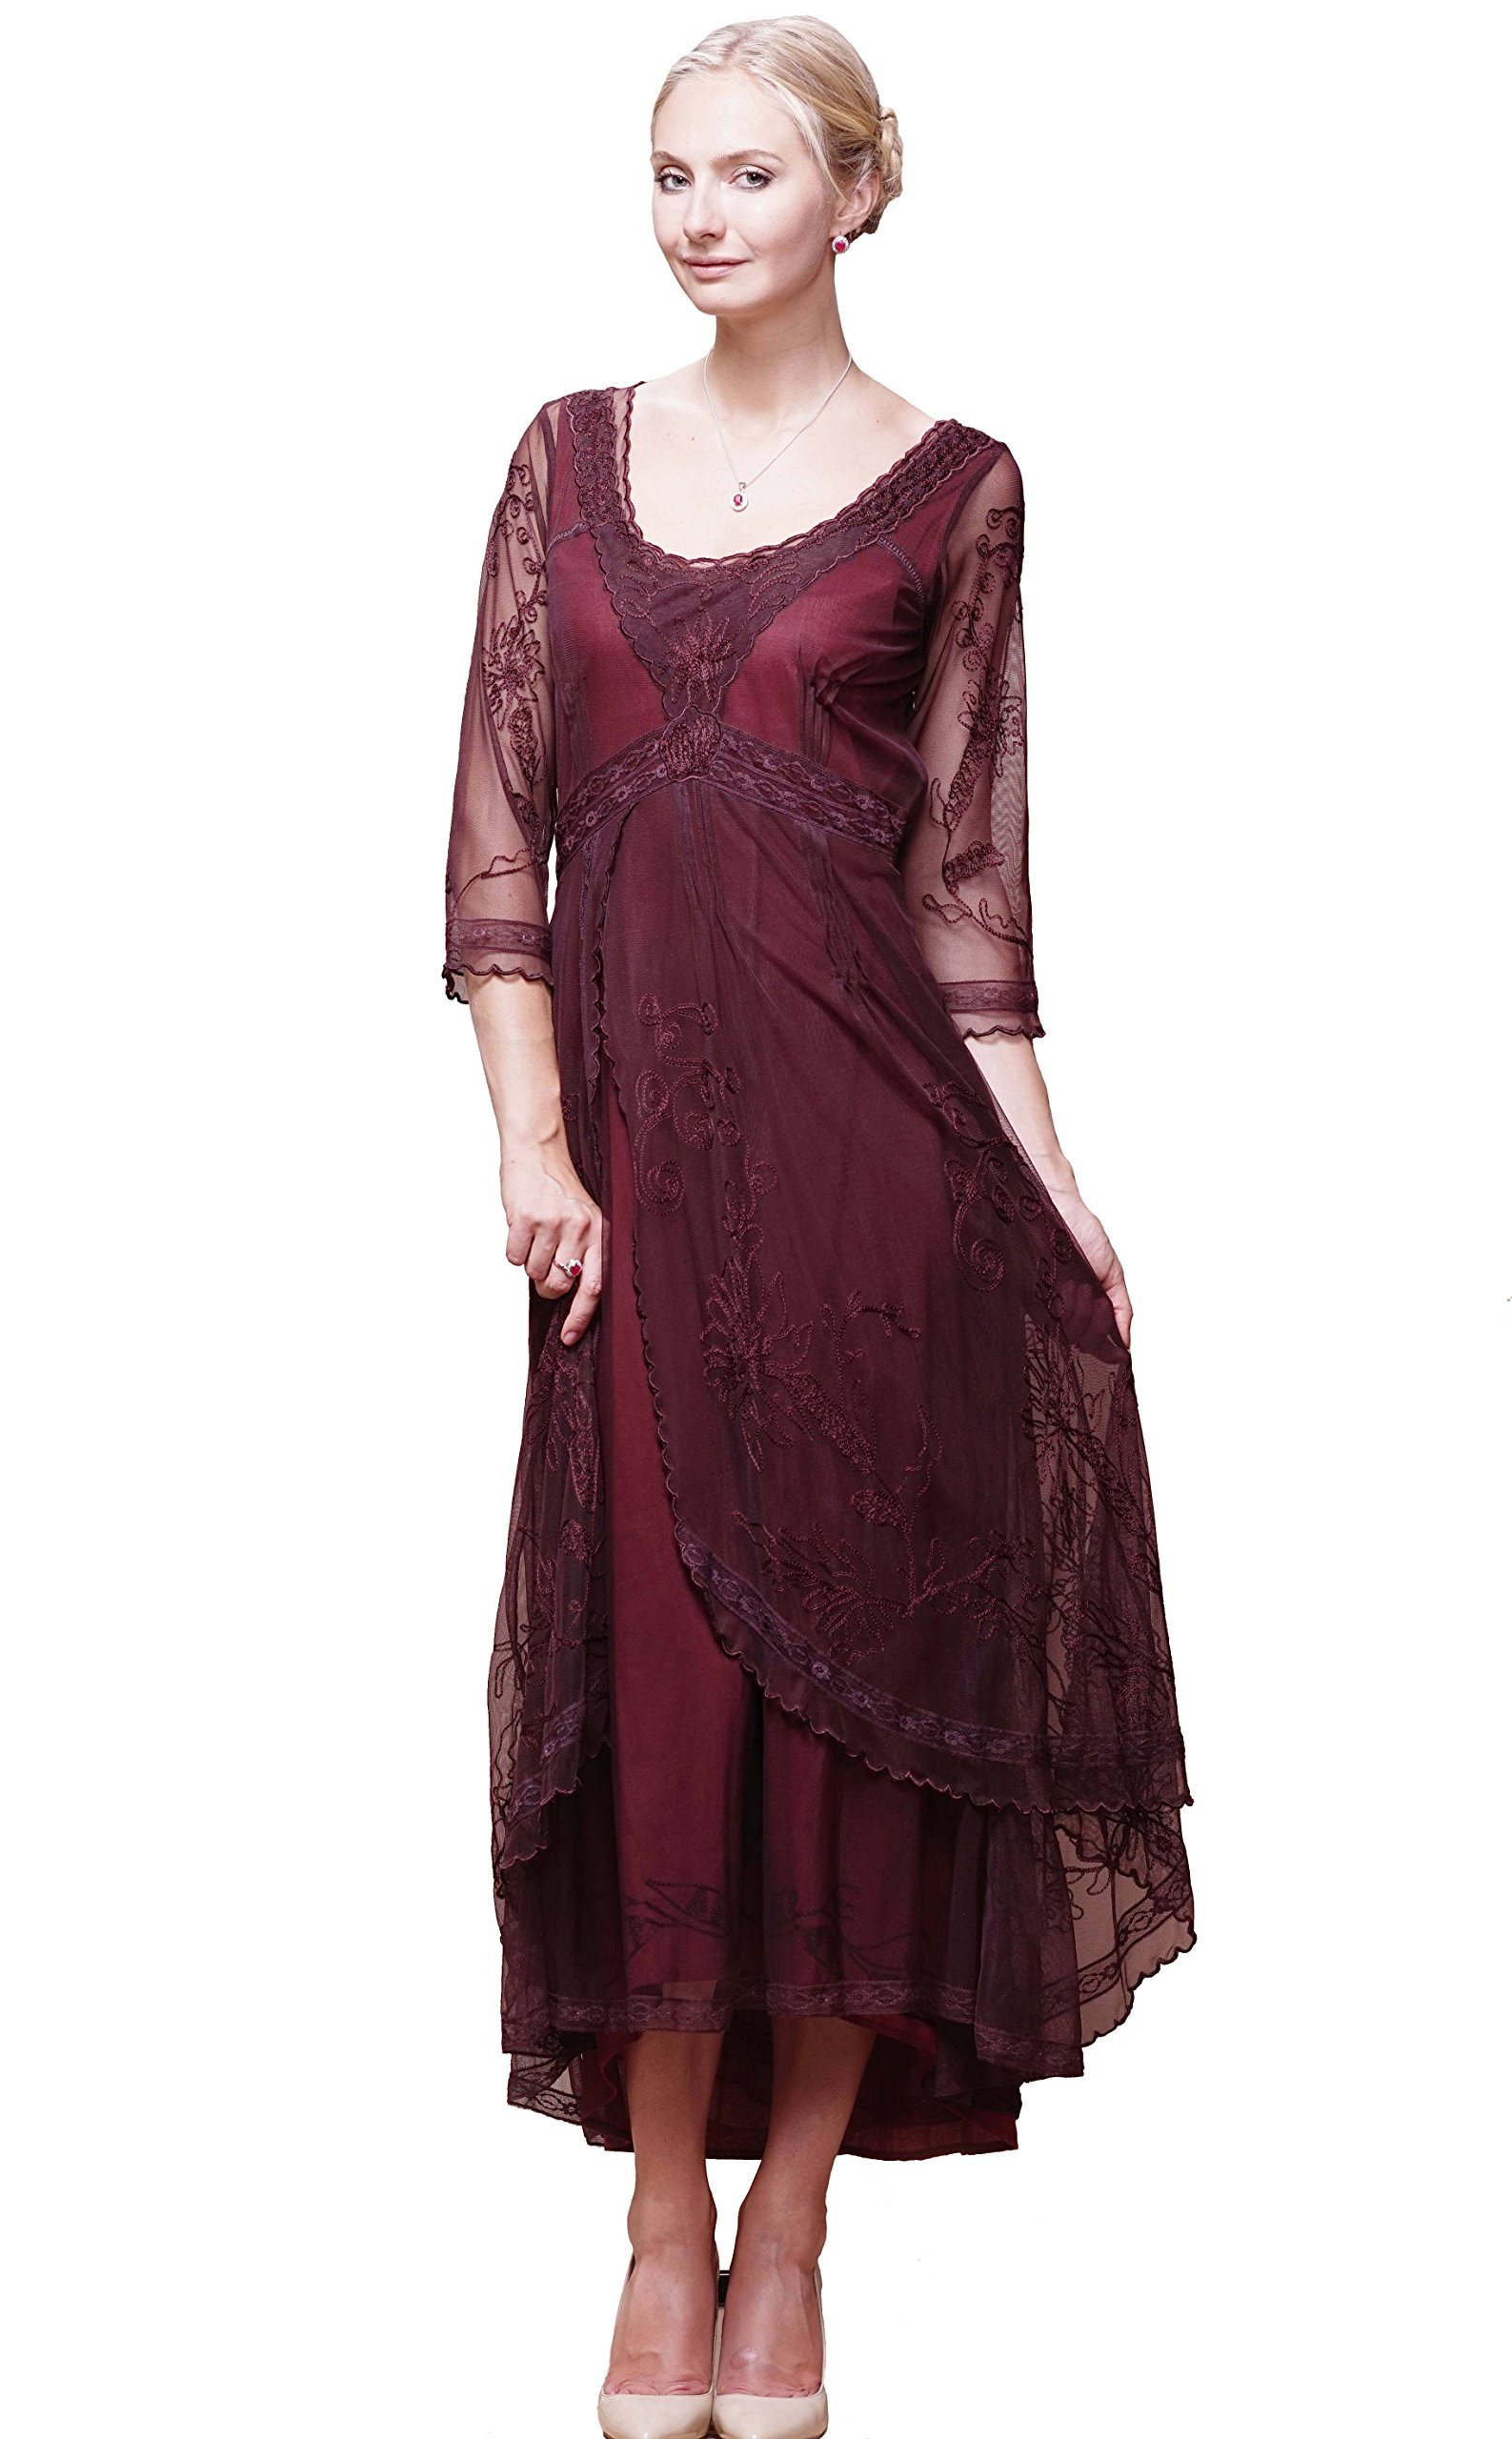 Nataya 40163 Women's Downton Abbey Vintage Style Wedding Dress in Ruby (L)